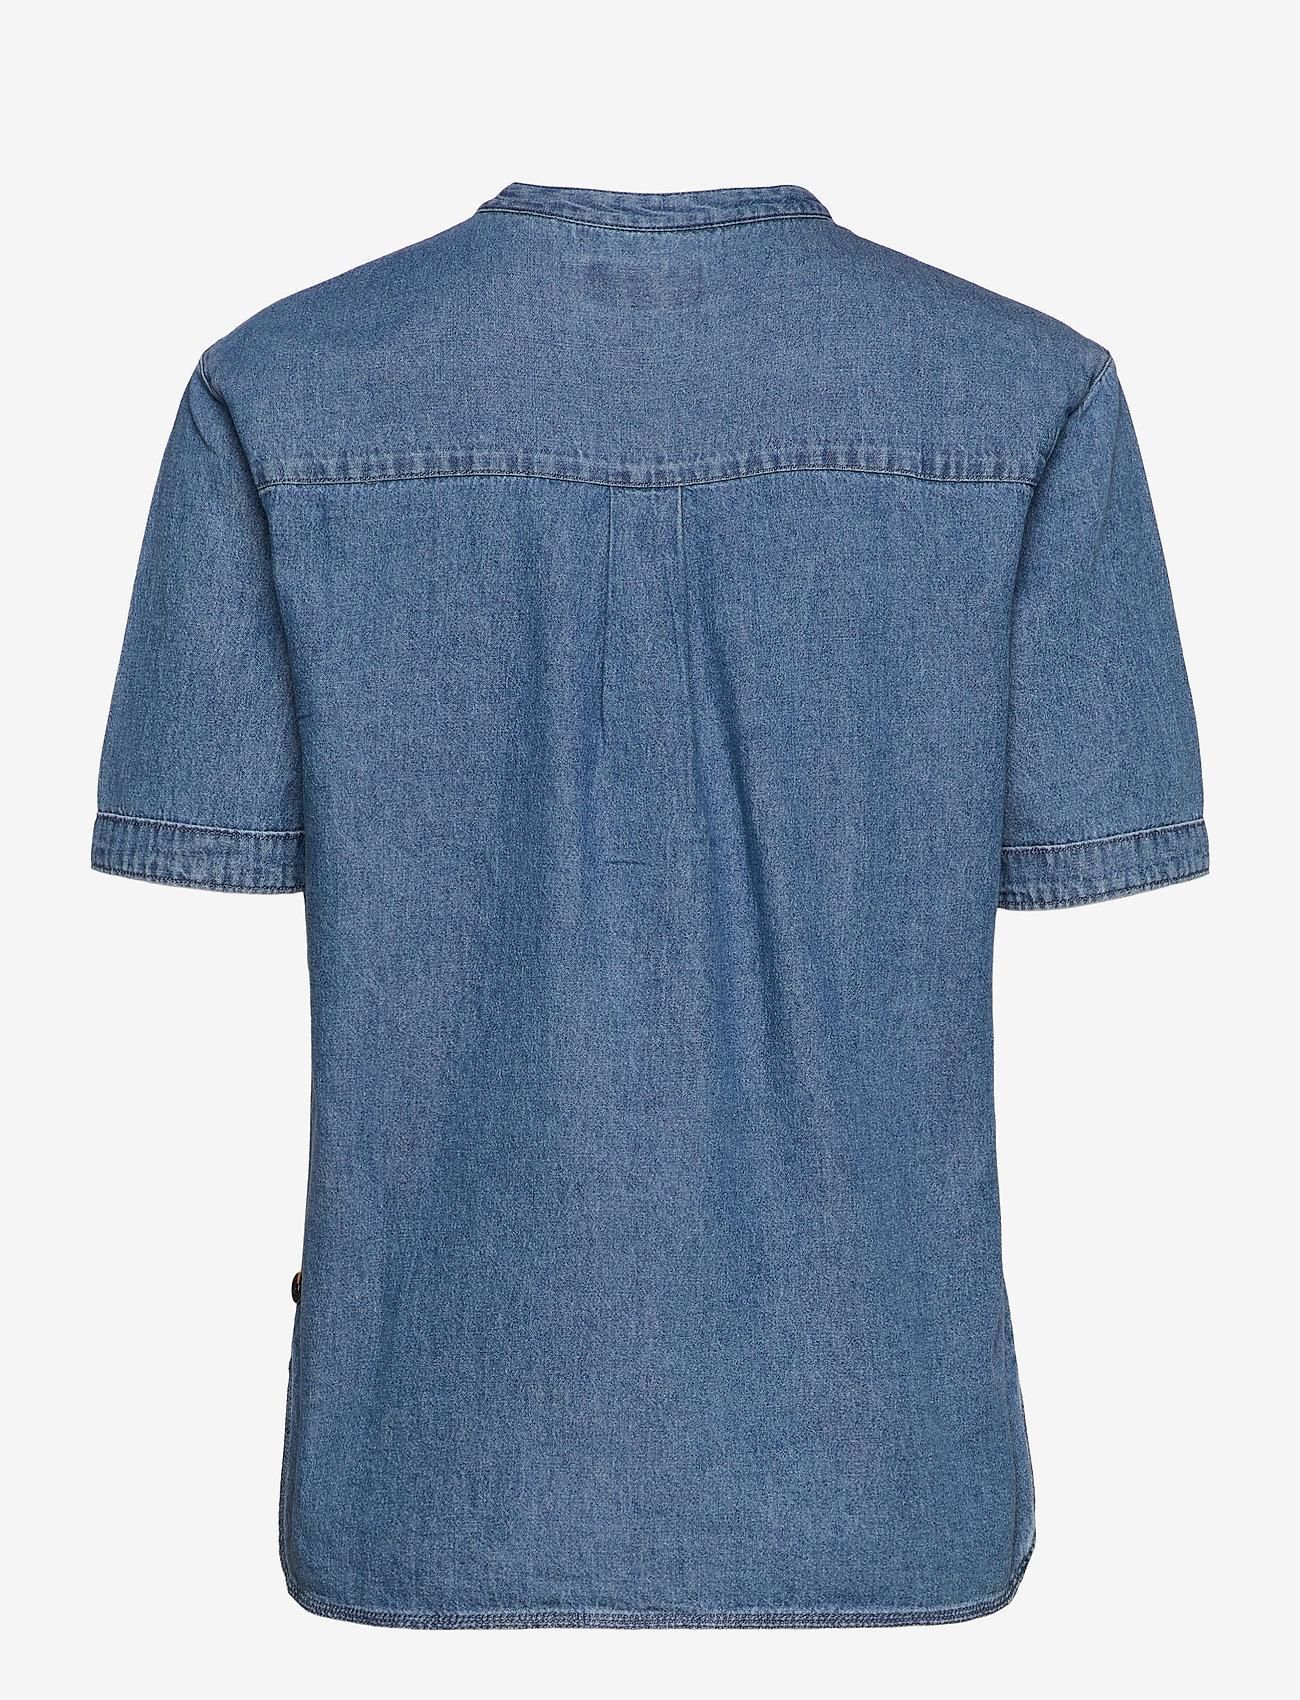 Superdry - GRANDAD BLOUSE - short-sleeved blouses - chambray - 1